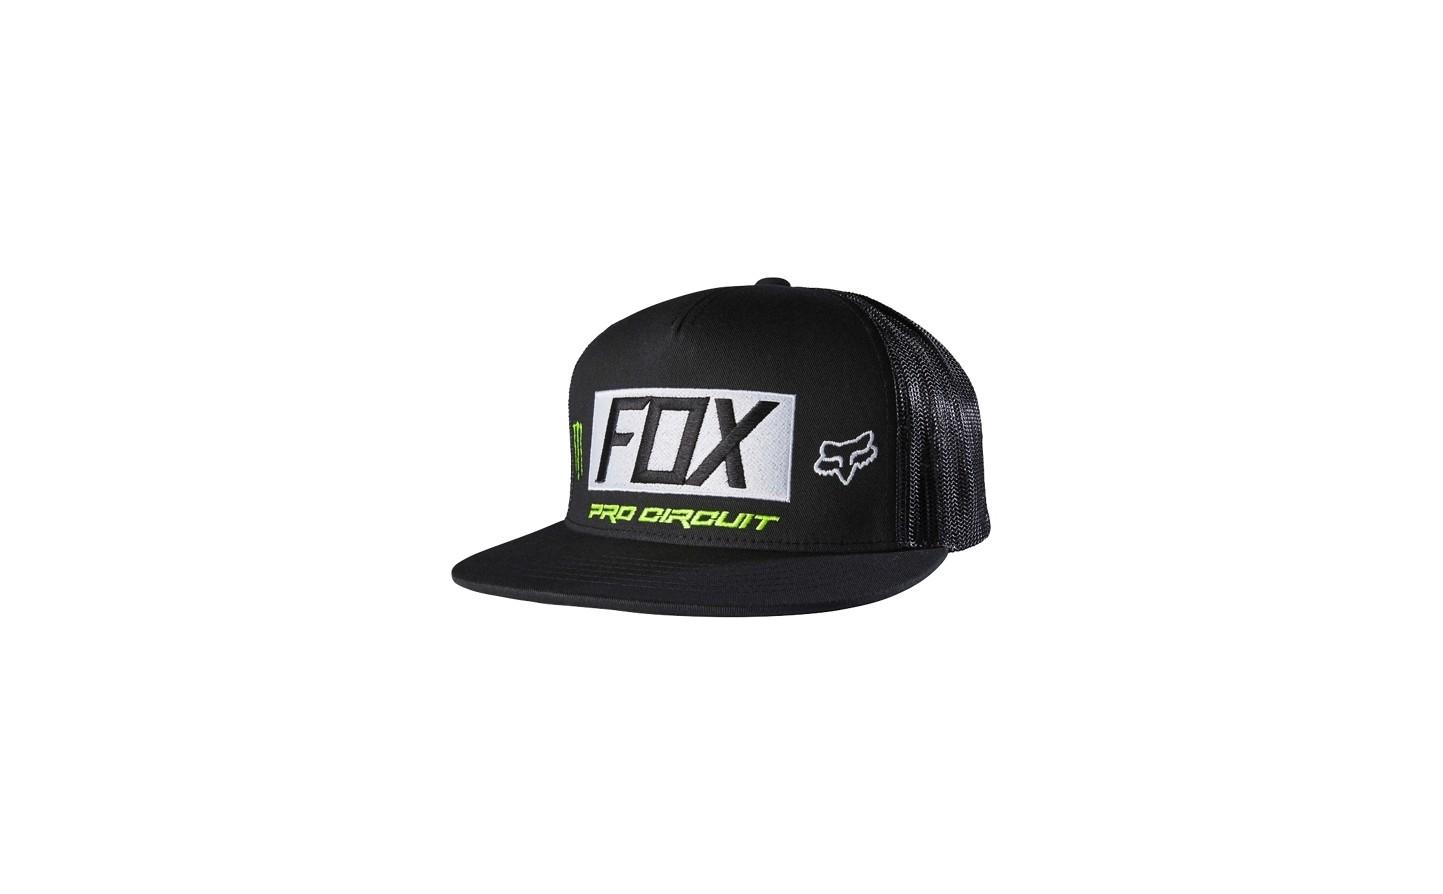 6798d27c79bf3 Gorra Fox Monster Paddock SB Pro Circuit